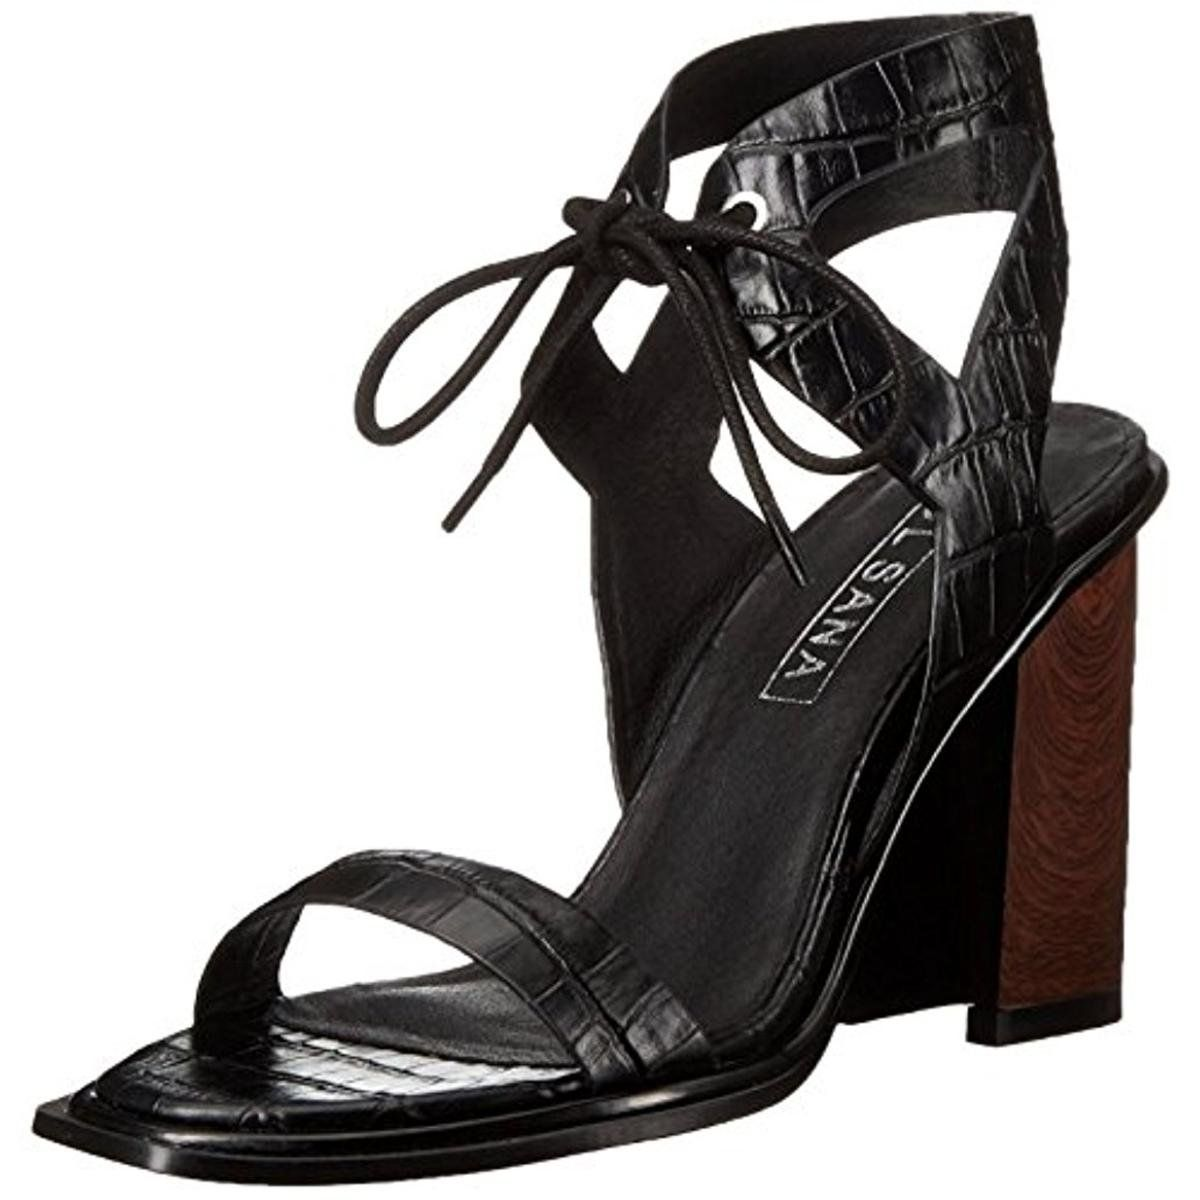 Black dress sandals medium heel - Sol Sana Women S Dolly Heel Dress Pump Black Crocodile 41 Eu 11 M